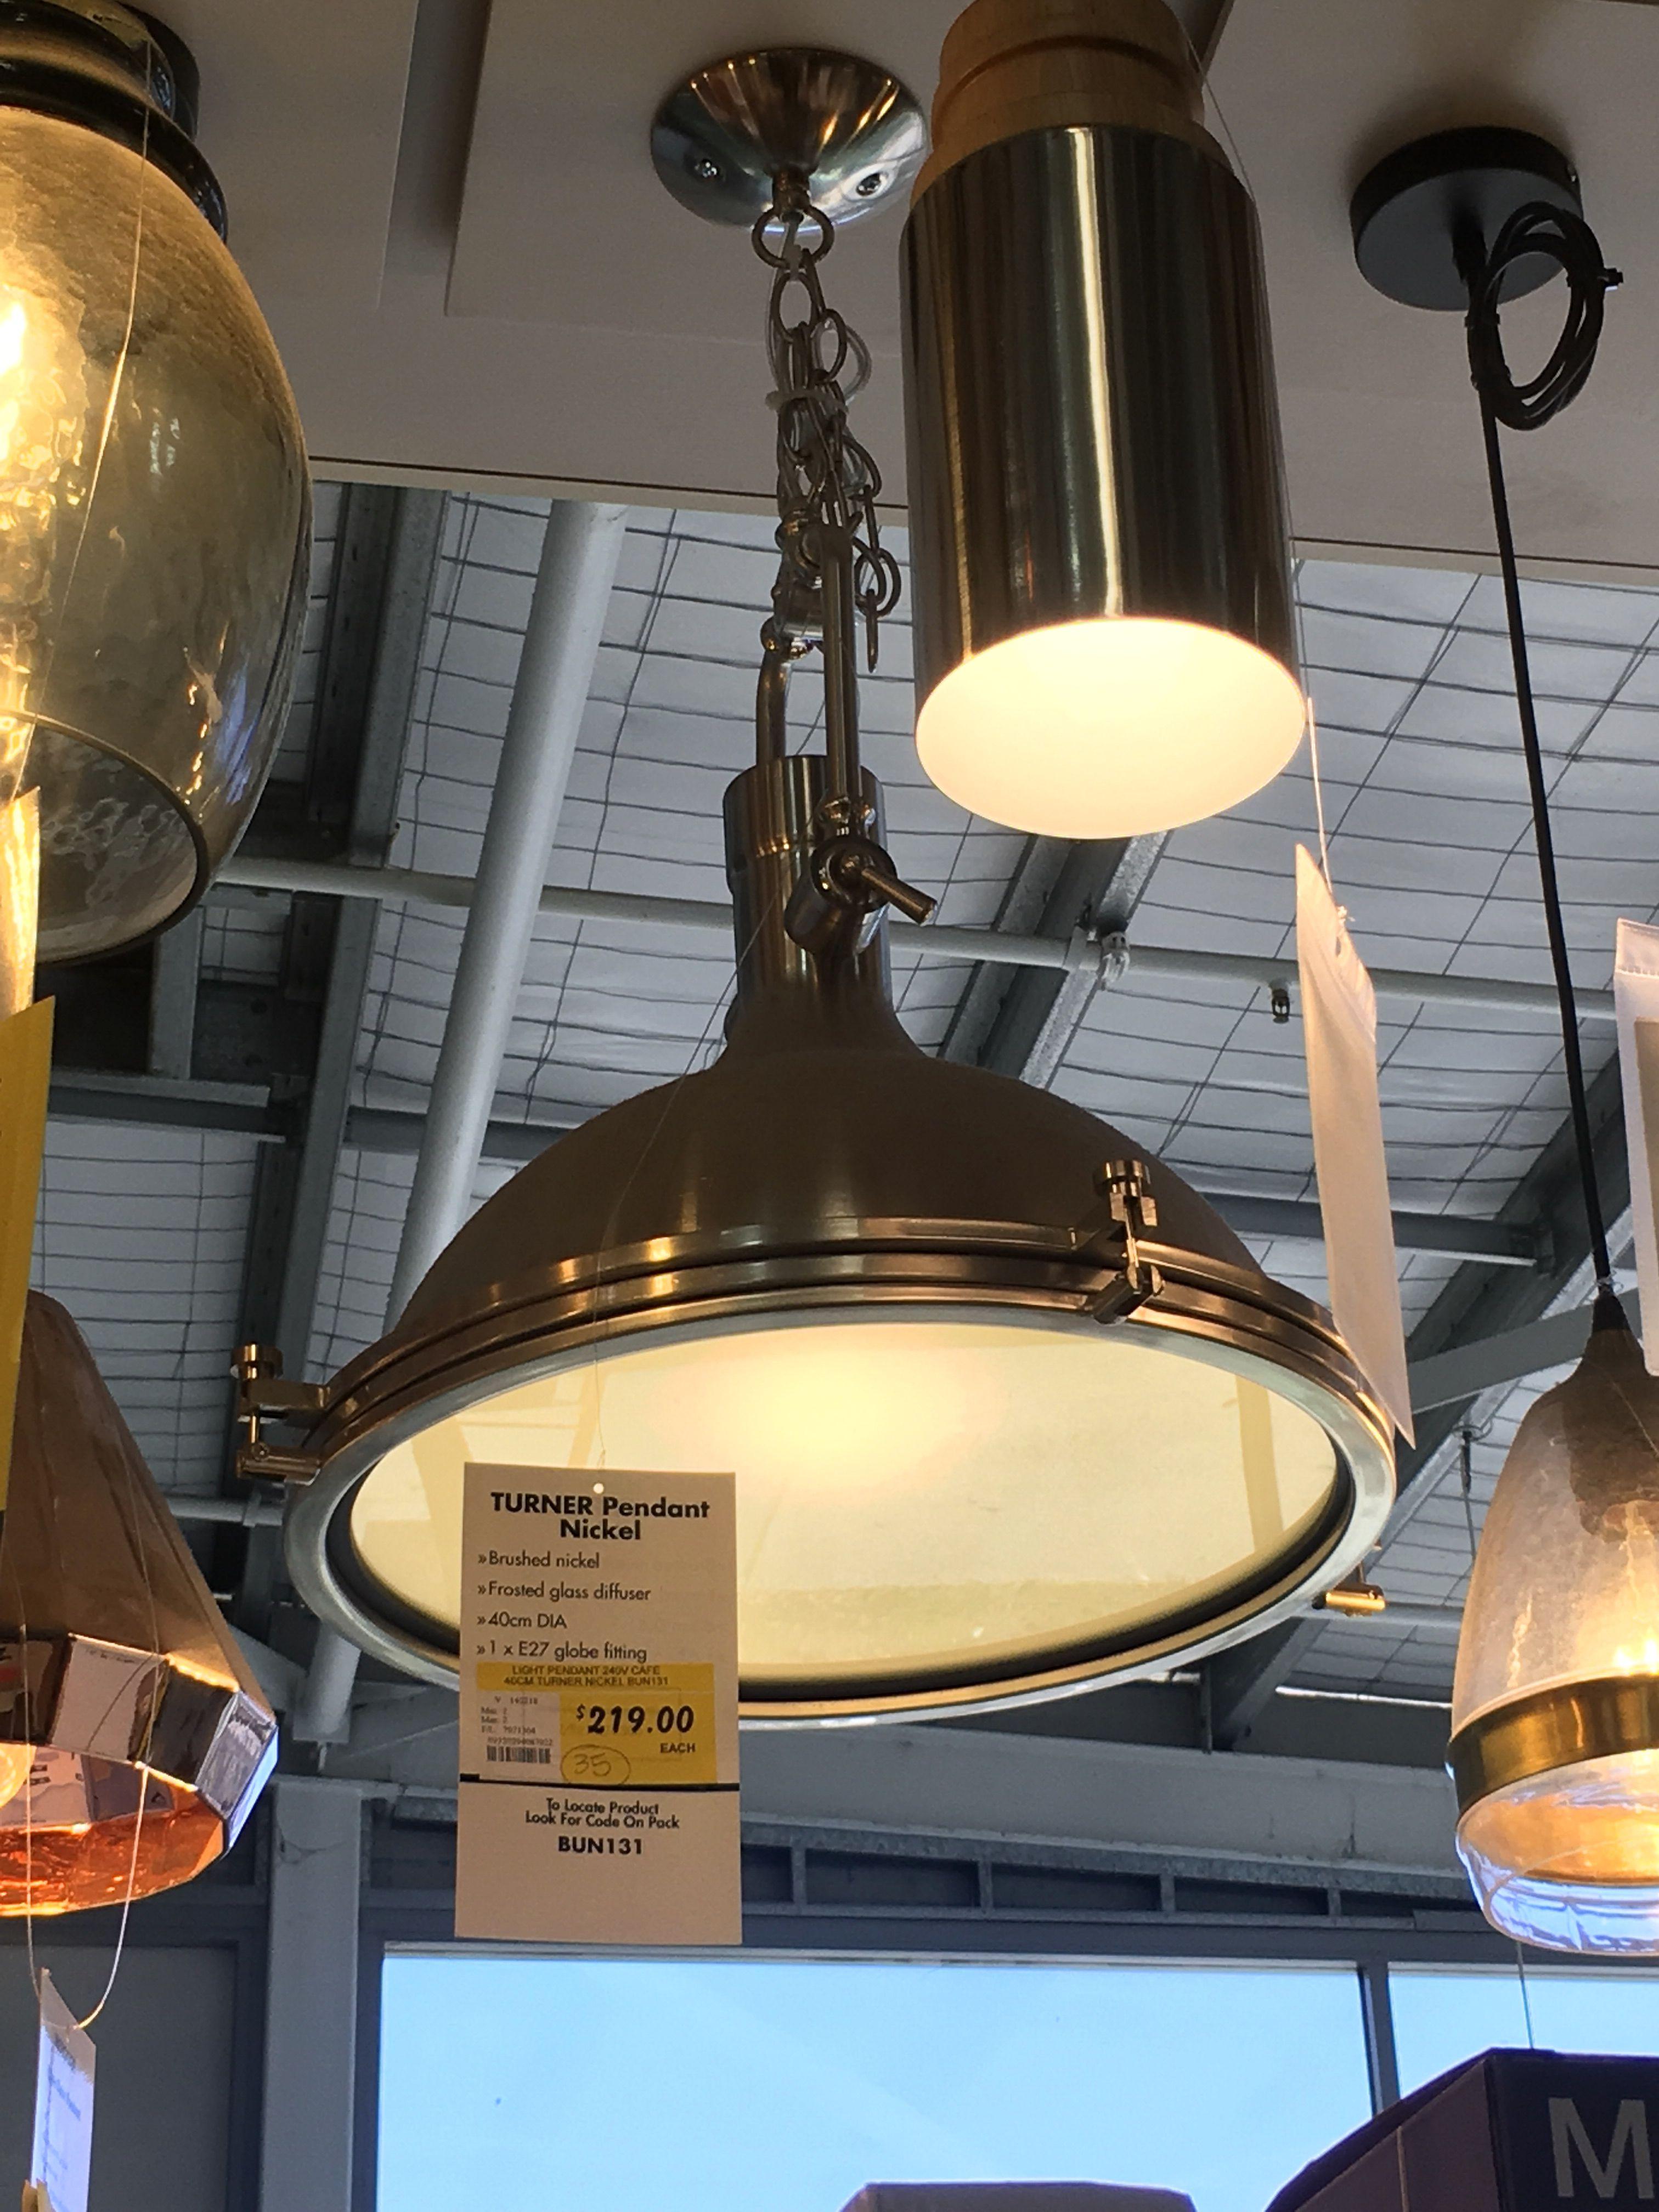 Turner Pendant Nickel And Batton Ceiling Lights Light Lighting